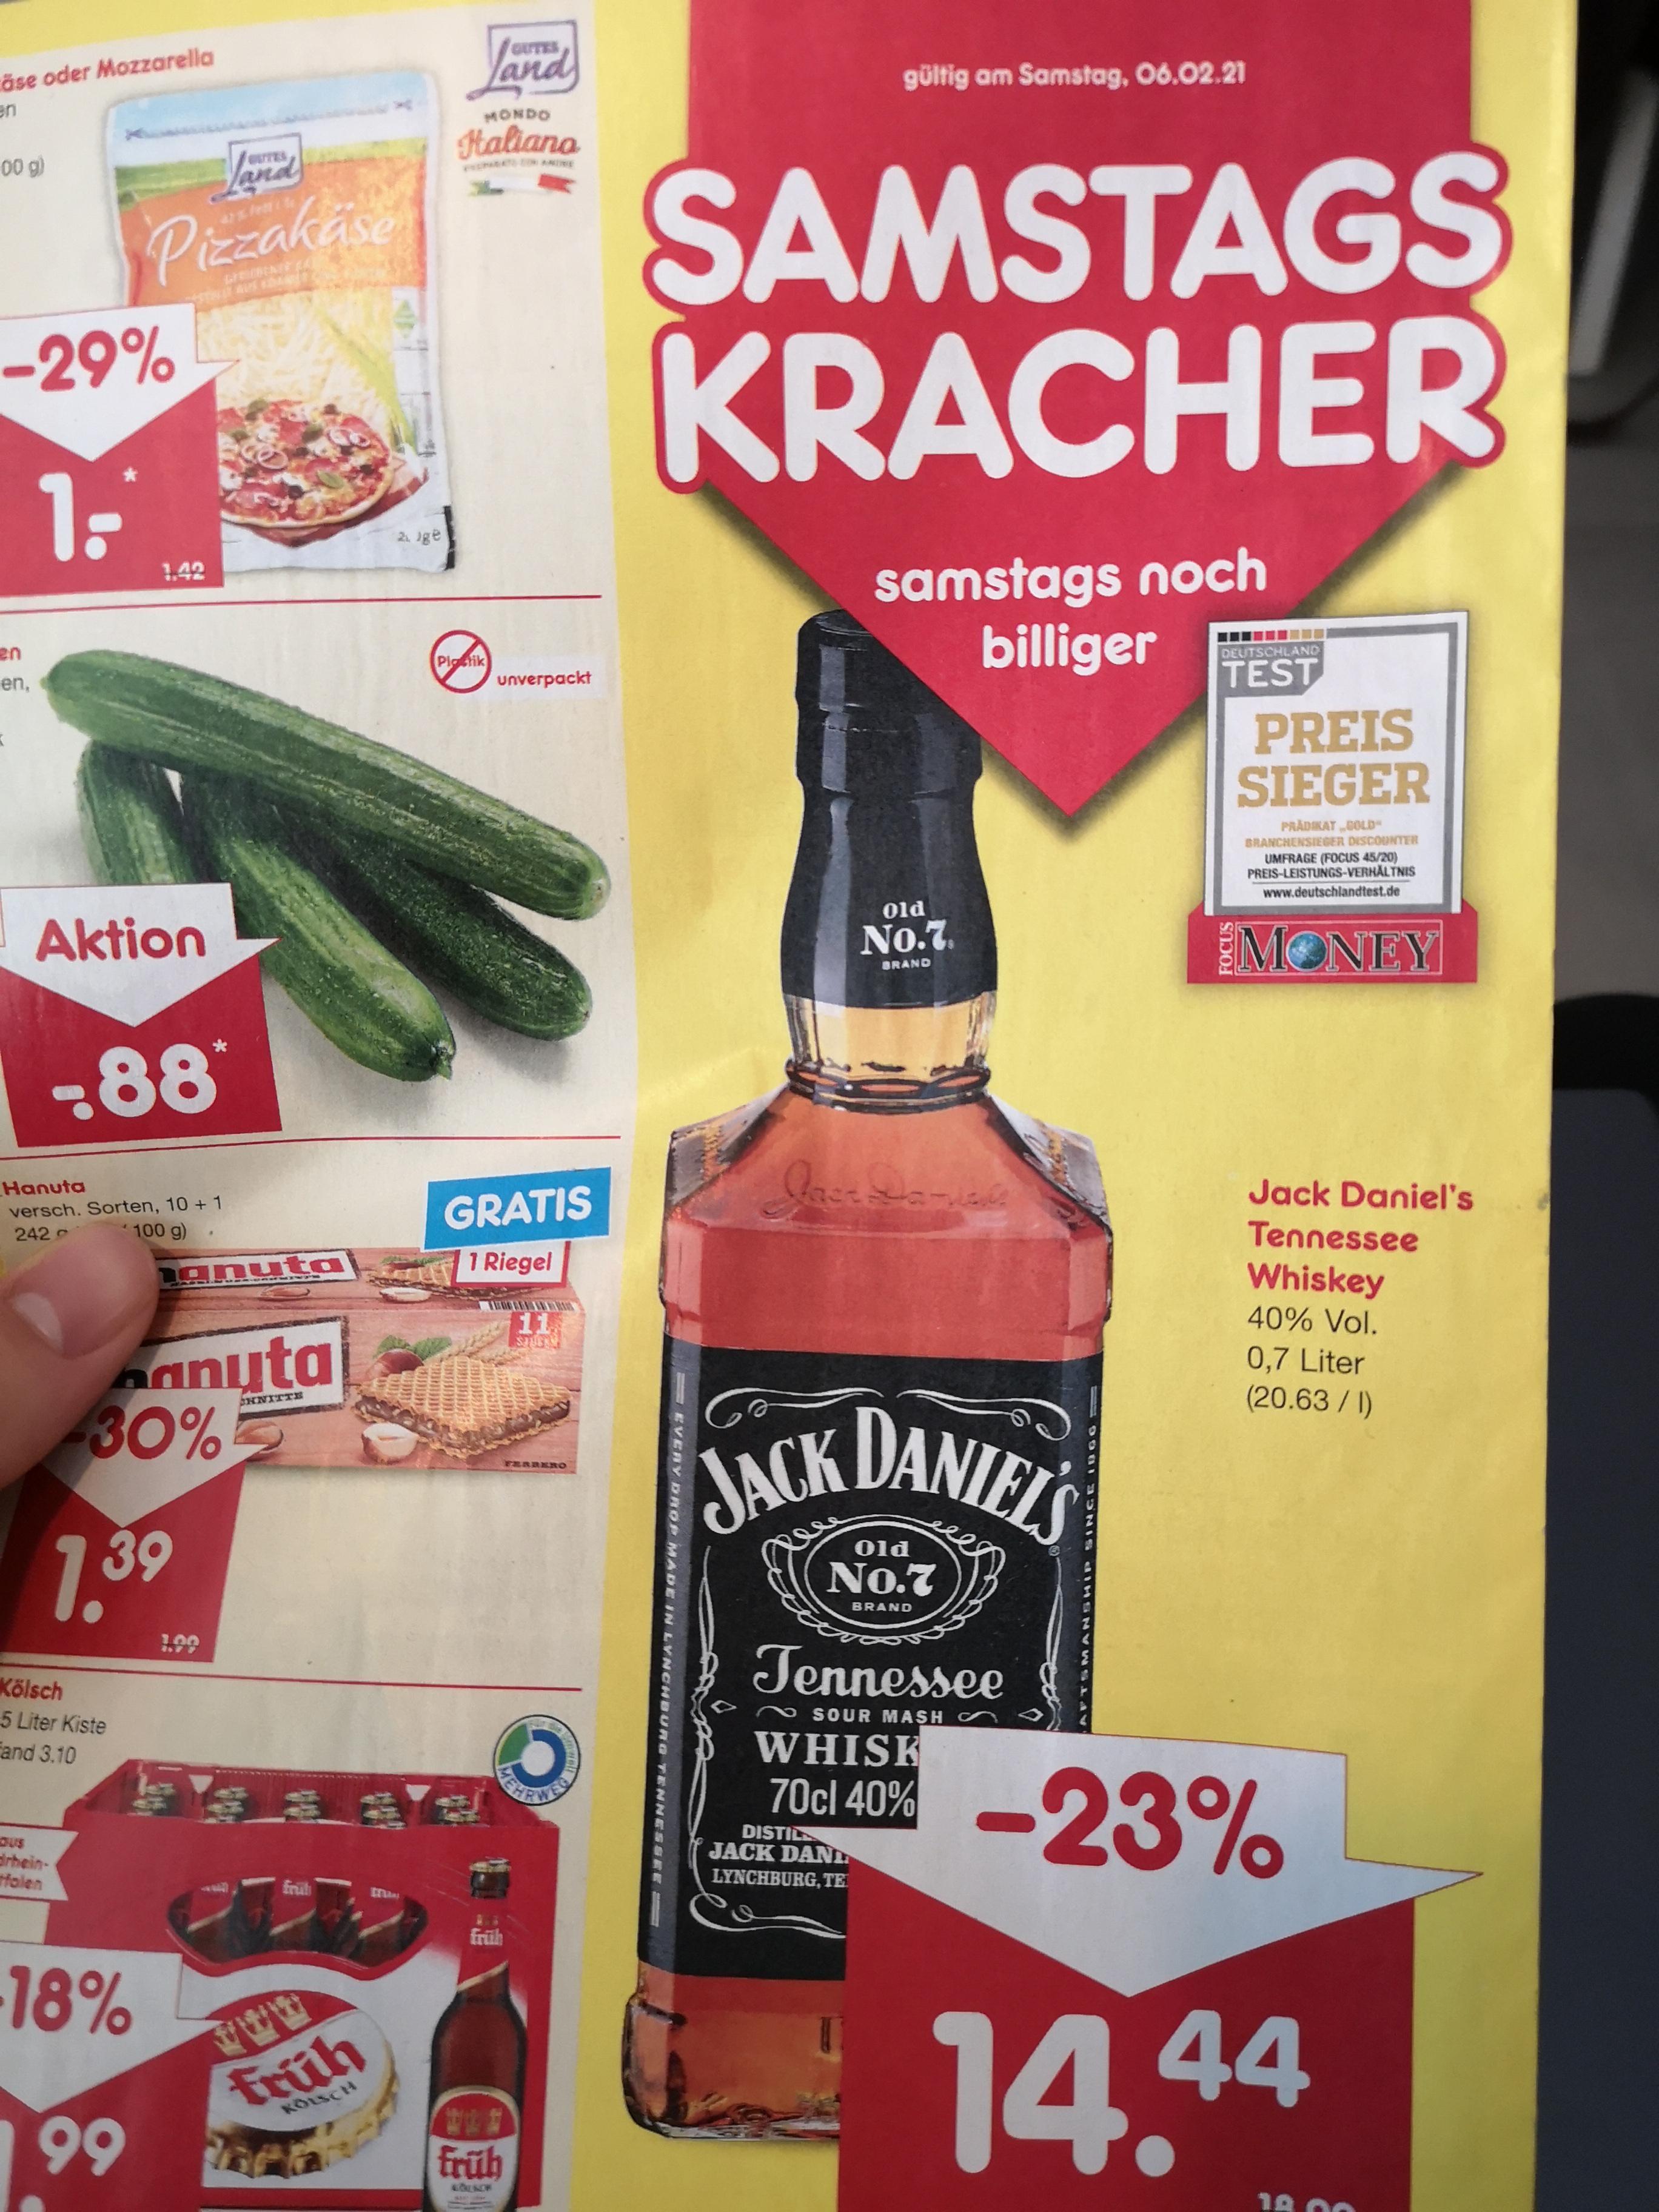 [Netto MD]Jack Daniel's (Daniels) 0,7 für effektiv 12,27€ nur Samstag 06.02.2021